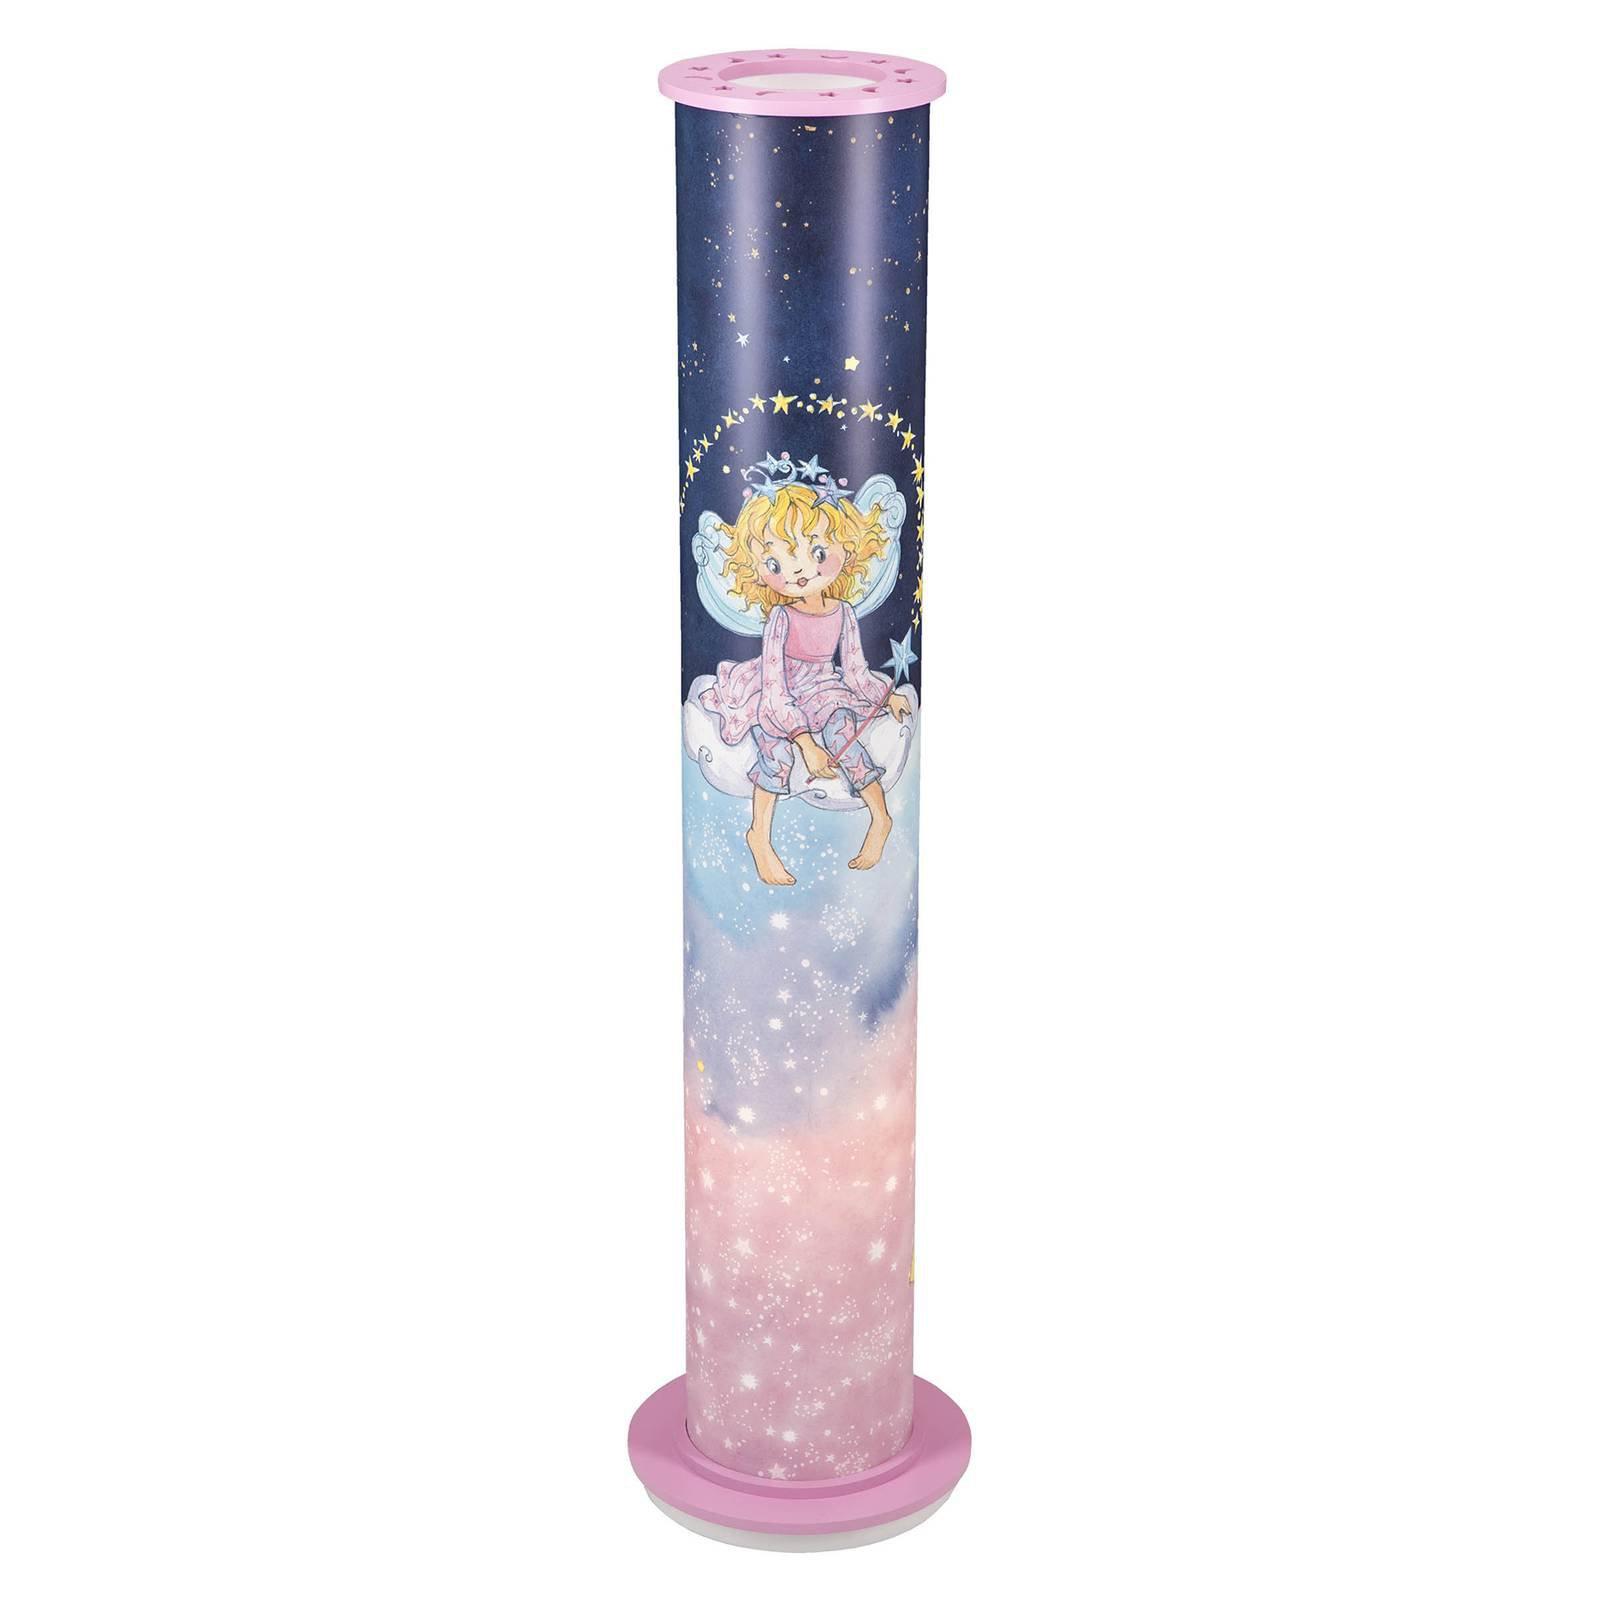 Gulvlampe Prinsesse Lillifee, stjerner